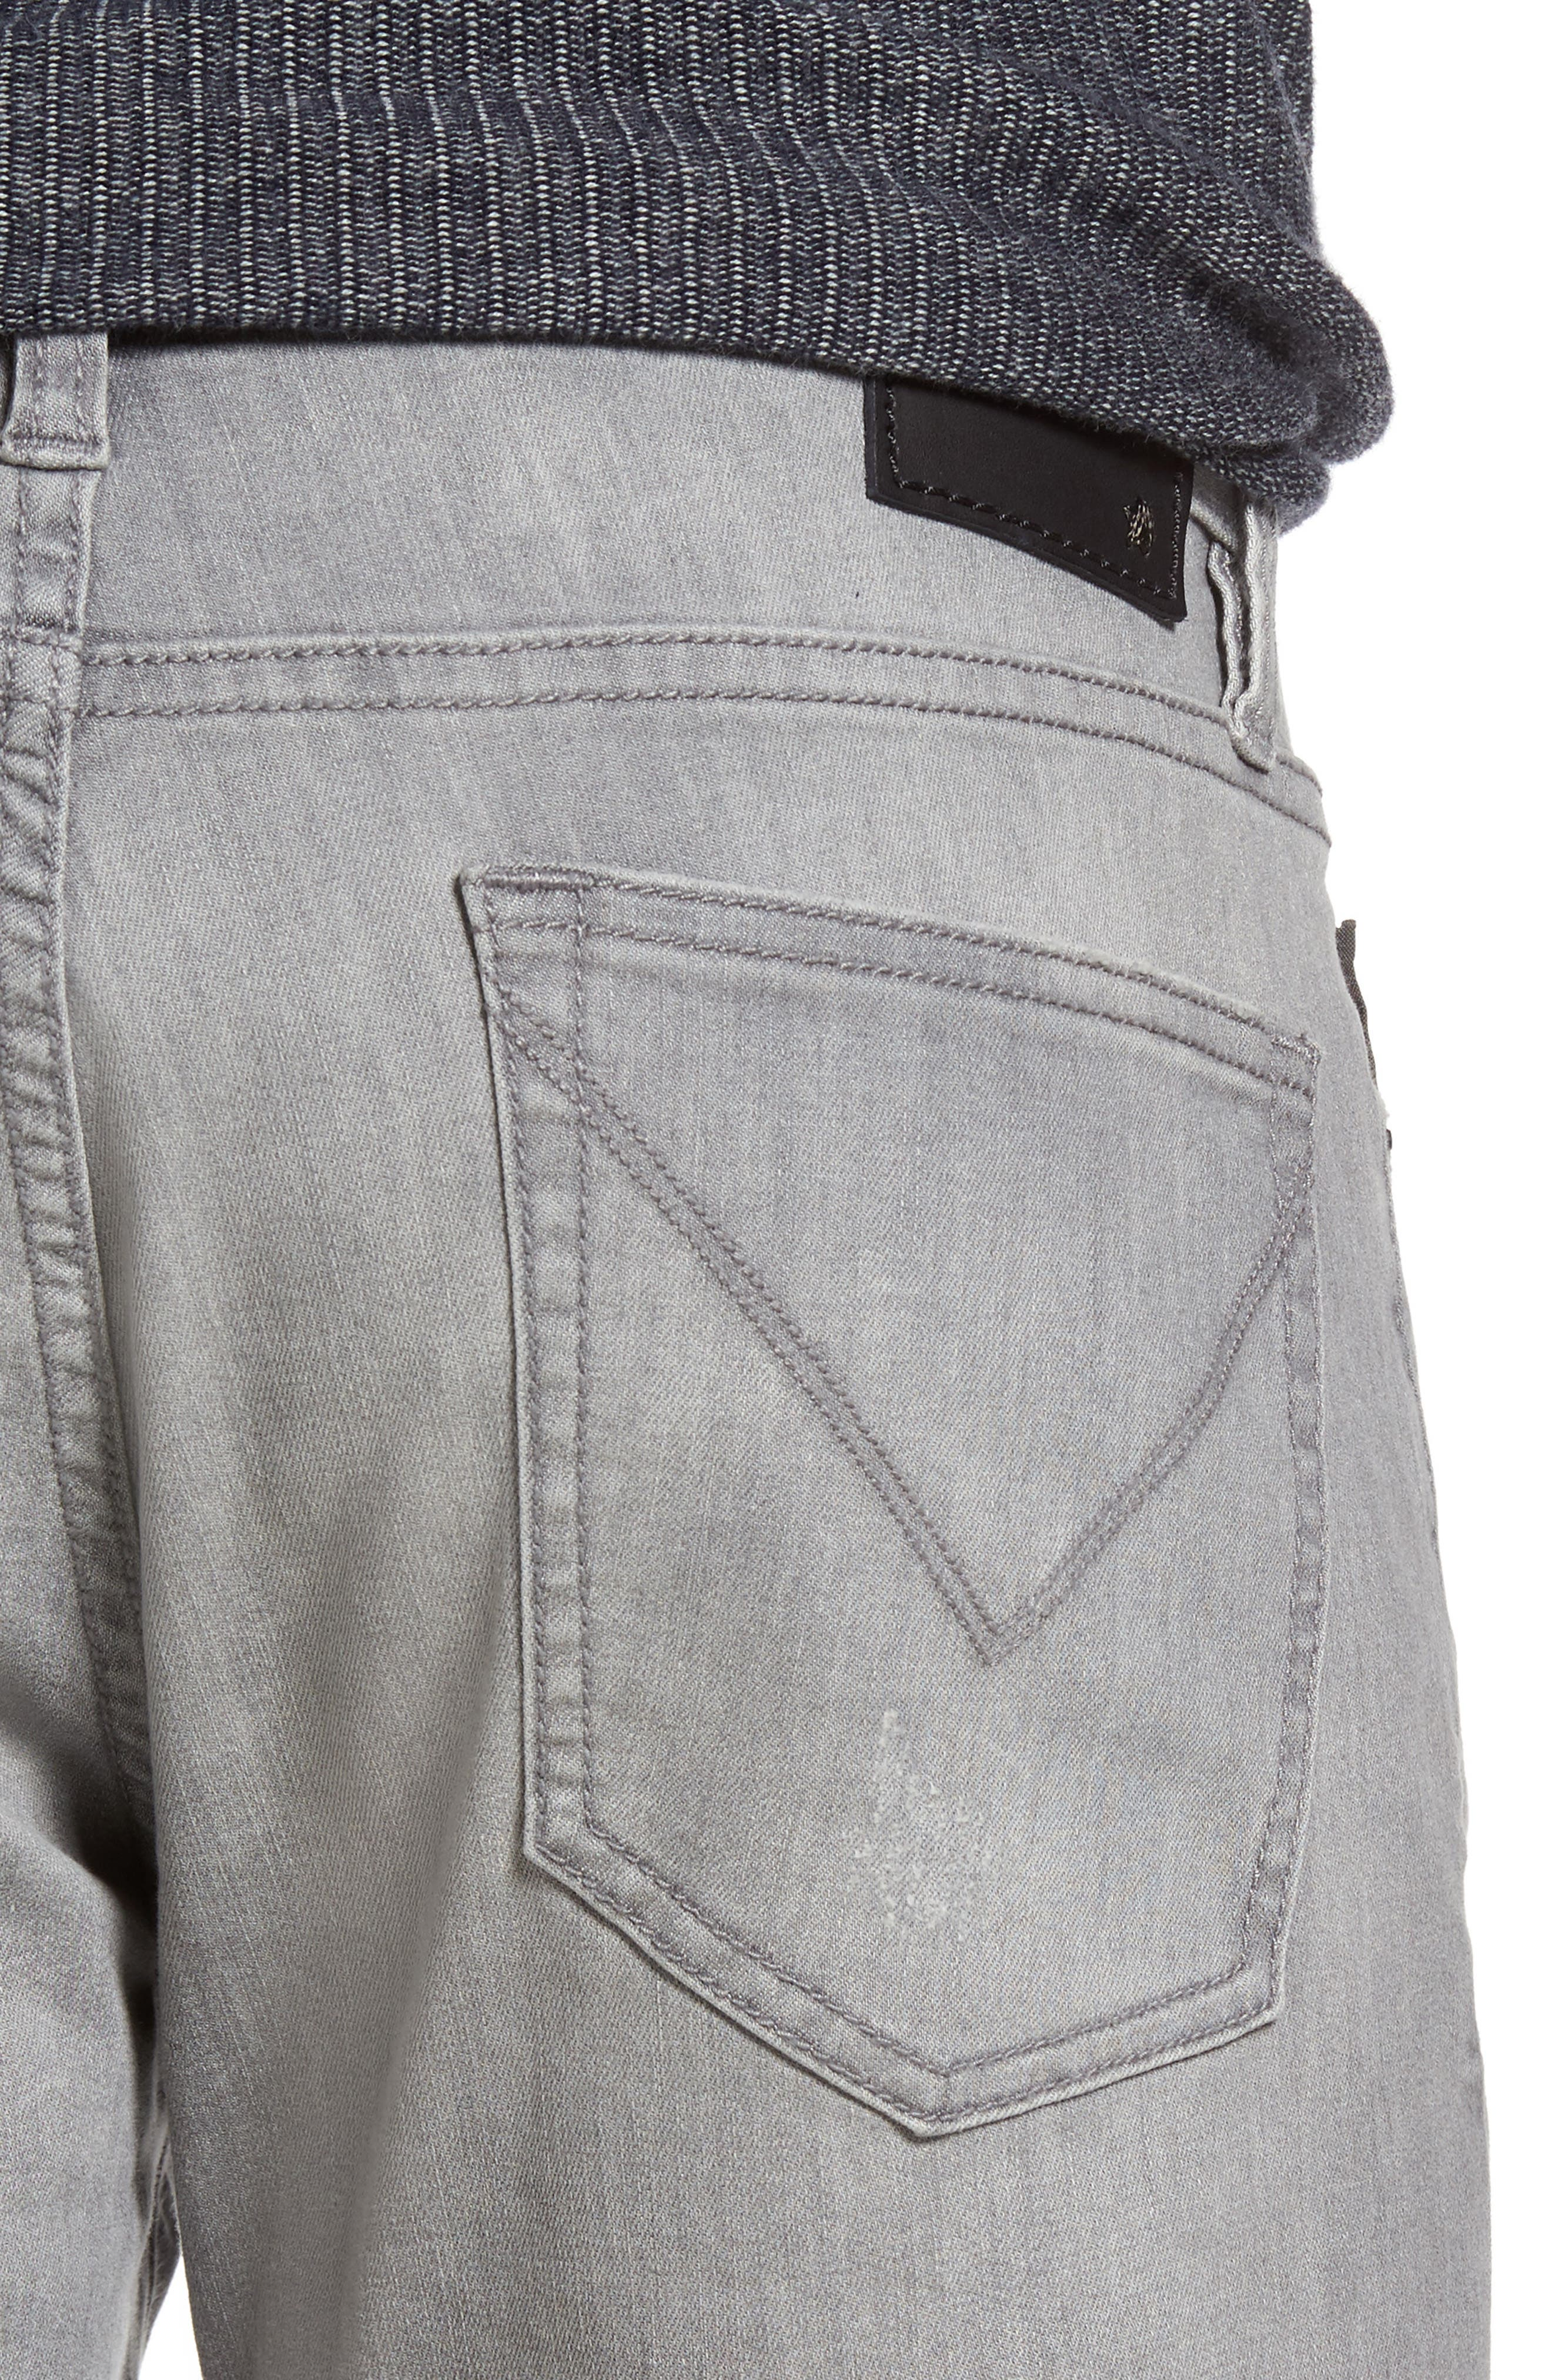 Wight Skinny Jeans,                             Alternate thumbnail 4, color,                             Medium Grey